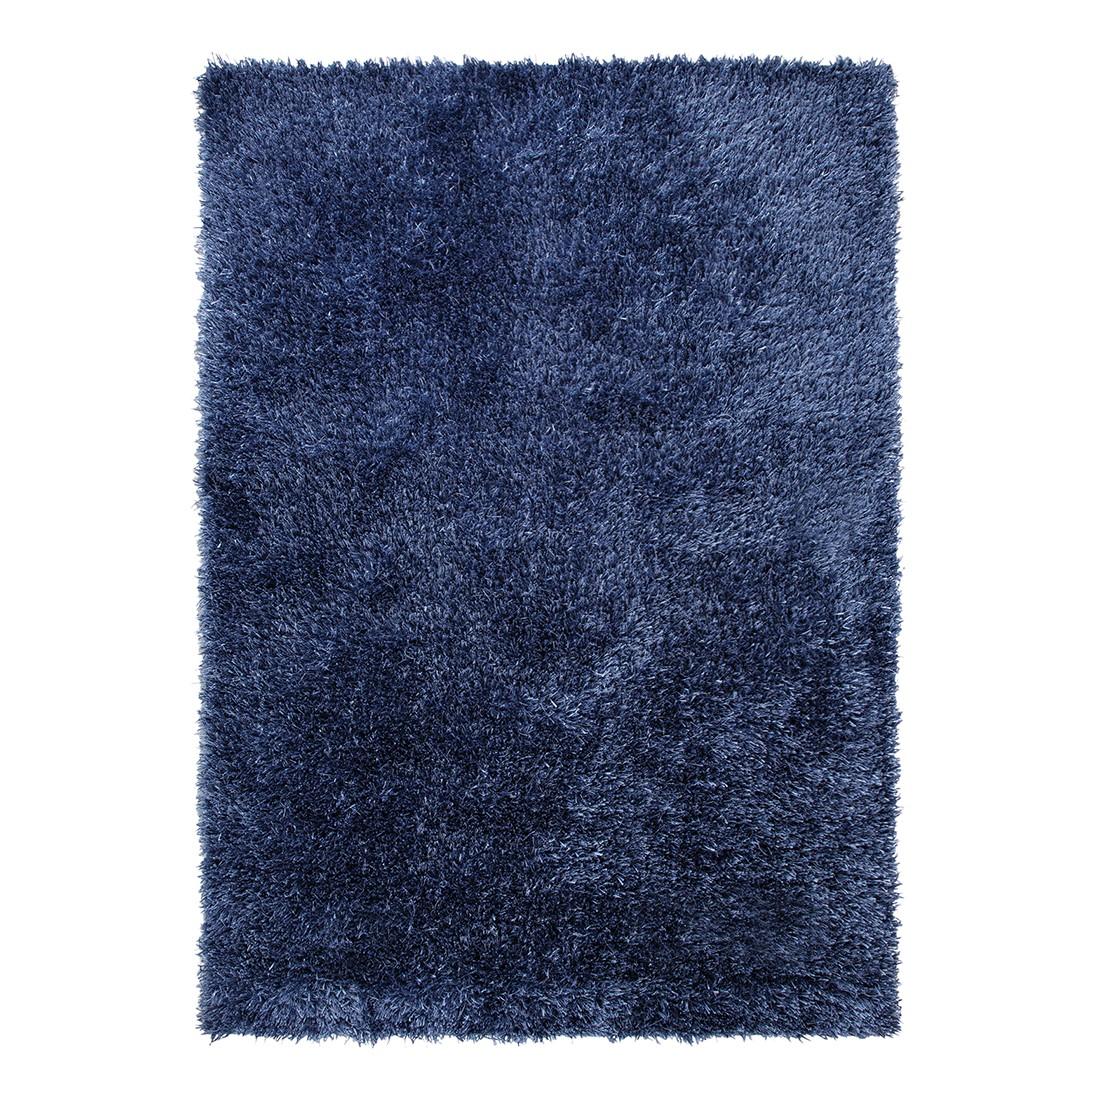 Teppich Cool Glamour - Blau - 140 x 200 cm, Esprit Home